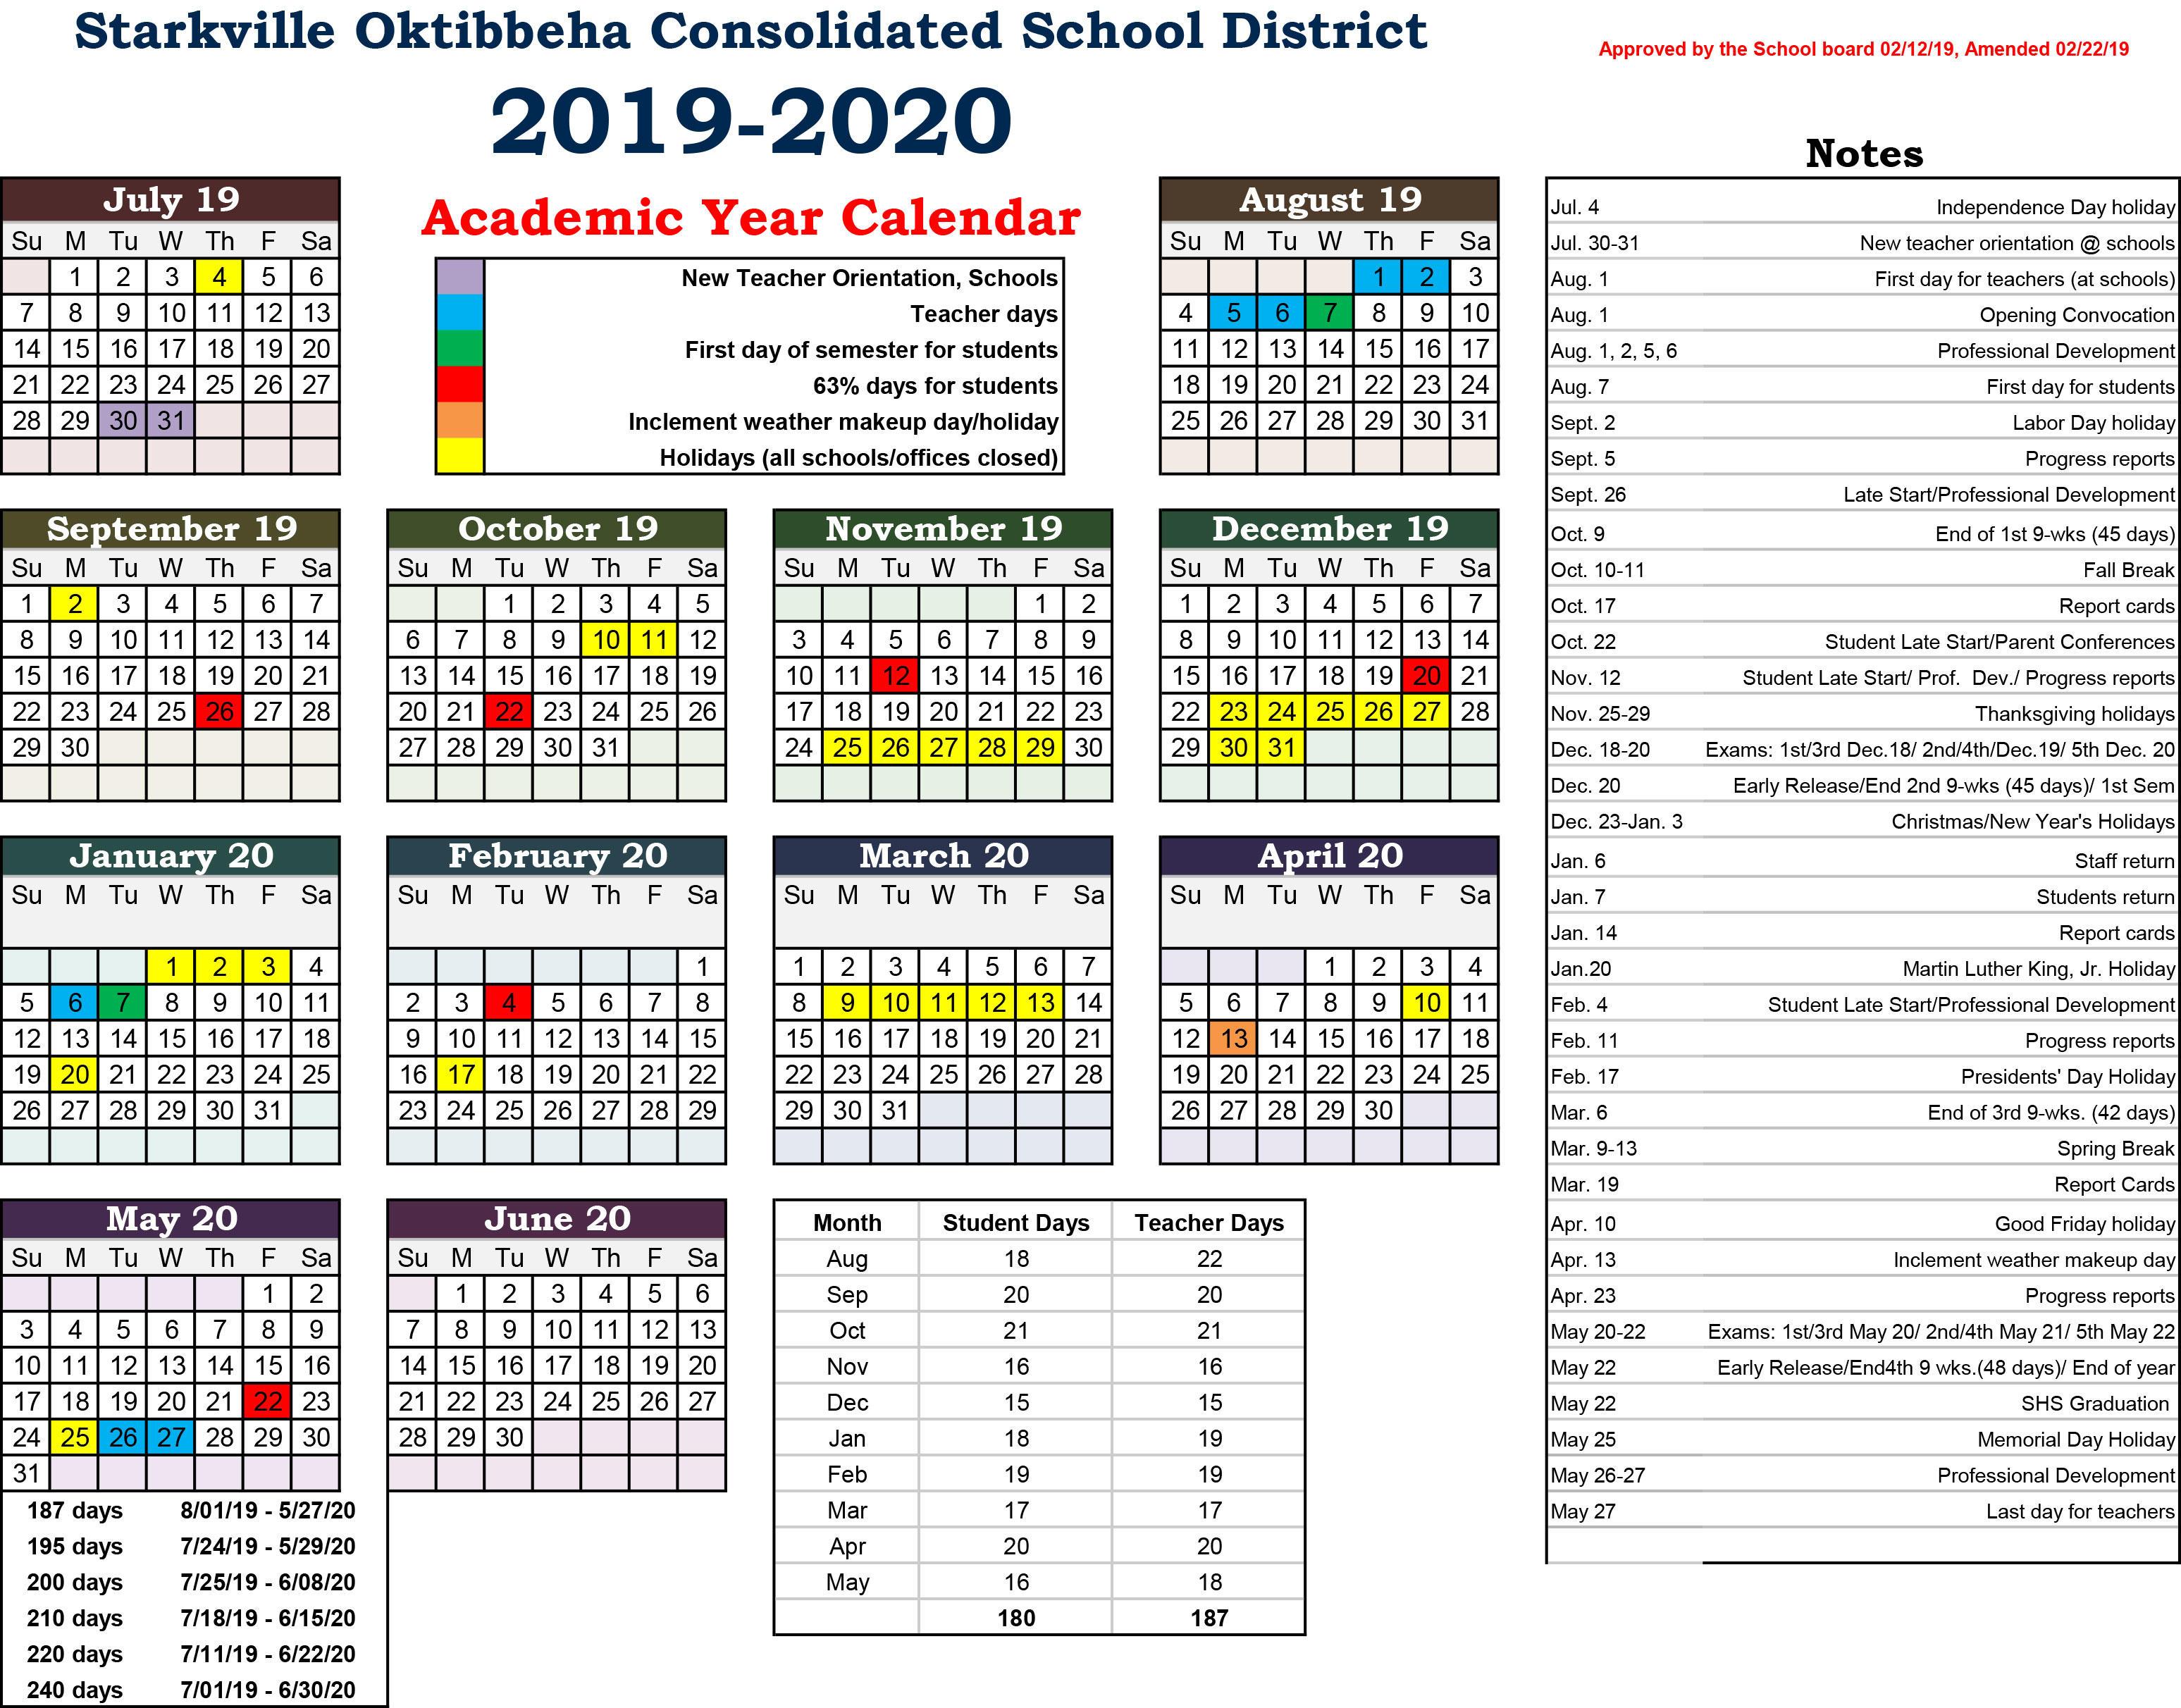 Academic Calendar | About SOCSD